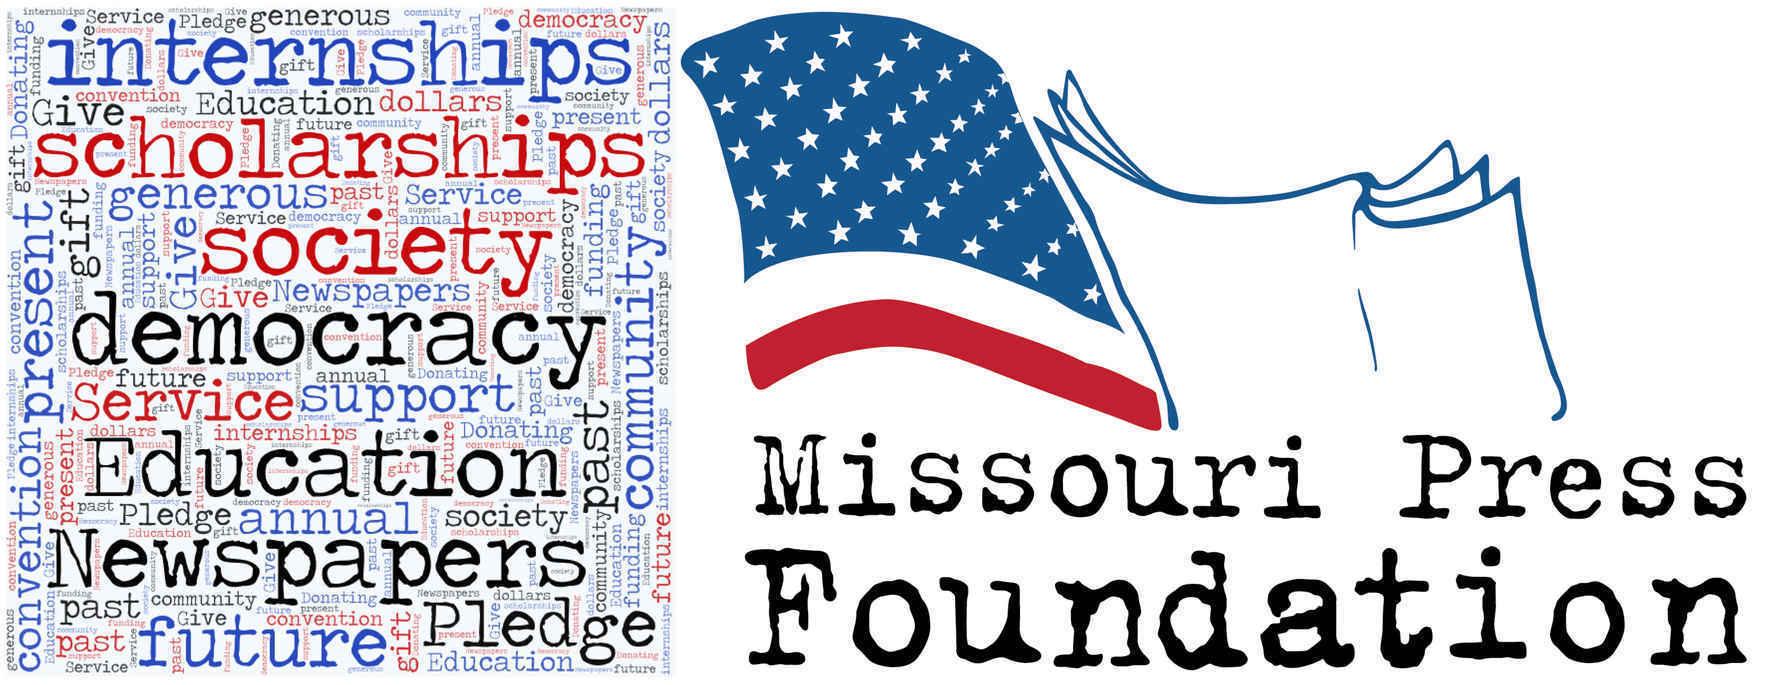 Support the Missouri Press Foundation image